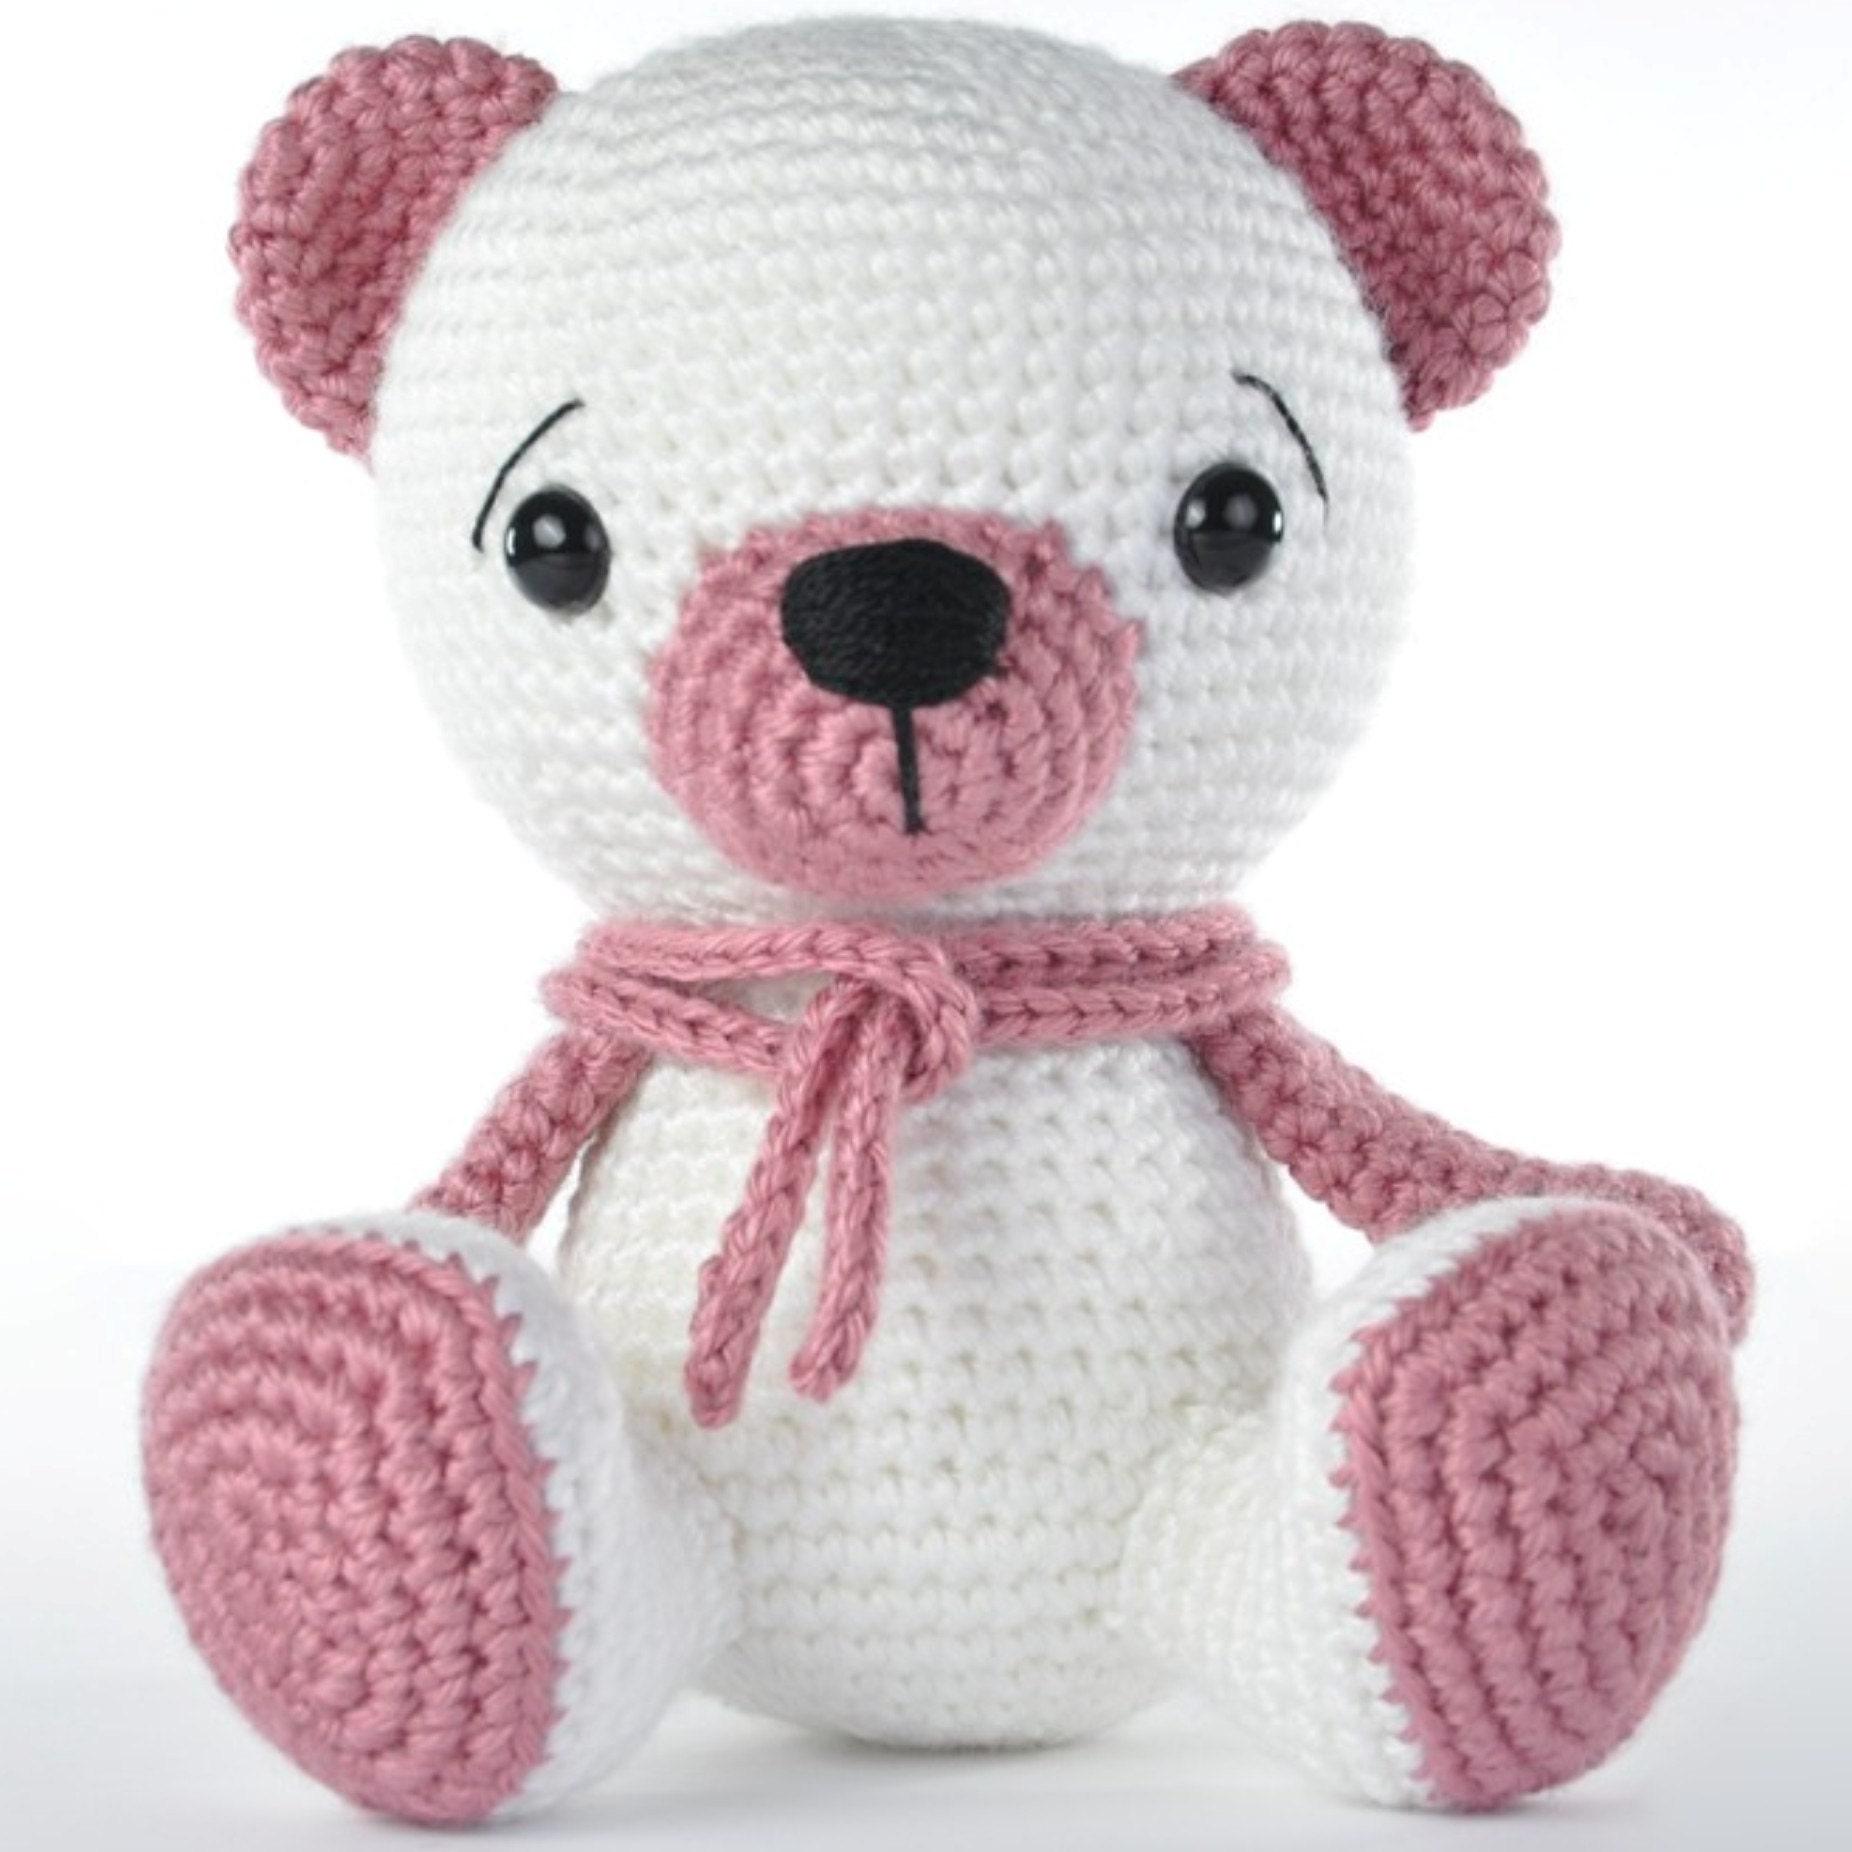 Crochet Amigurumi Patterns Toys By Tatiesofttoys On Etsy